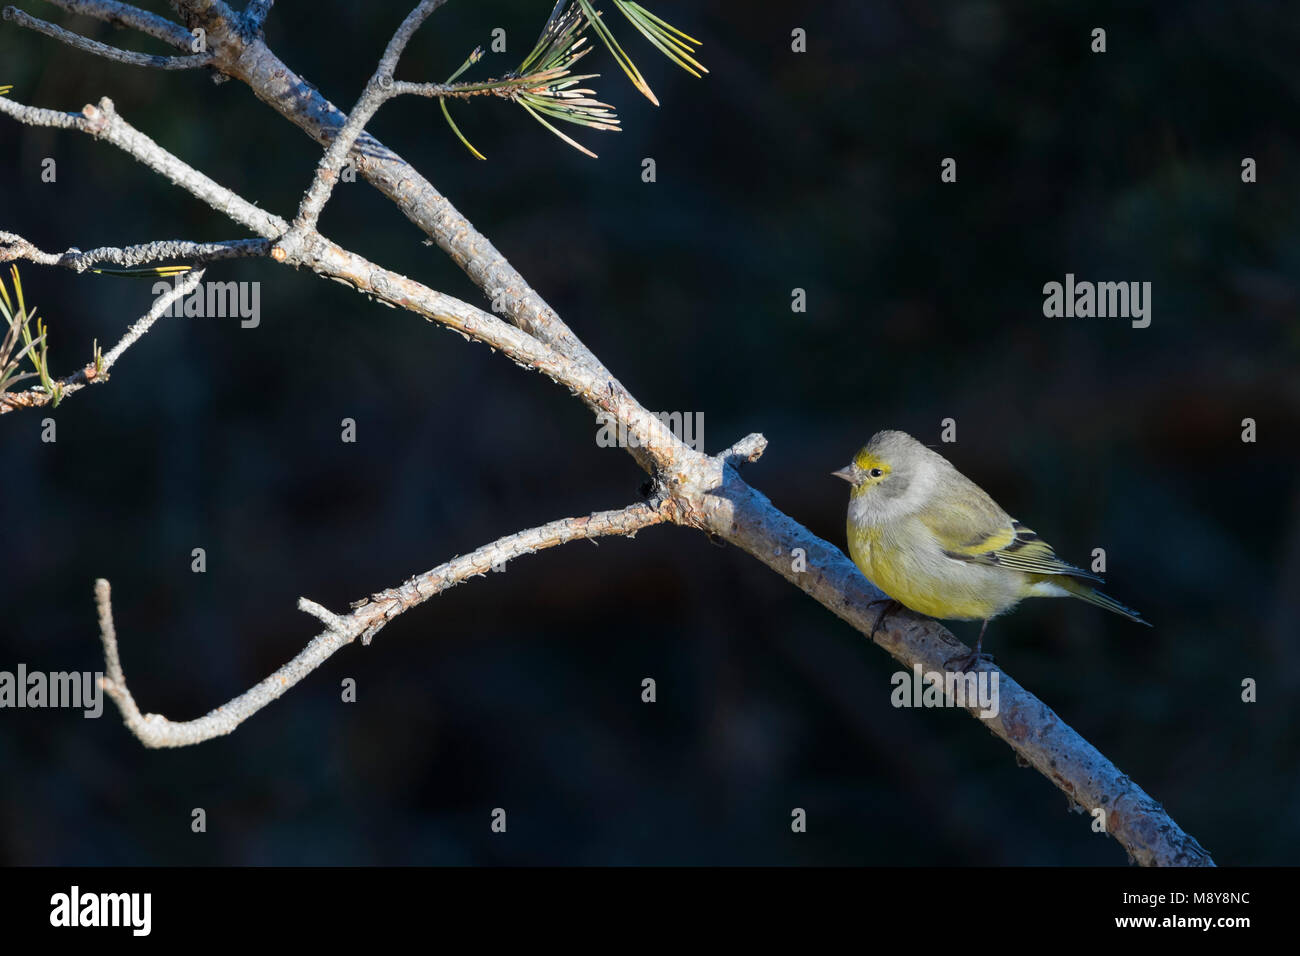 Citril Finch - Zitronengirlitz - Carduelis citrinella, Spain - Stock Image